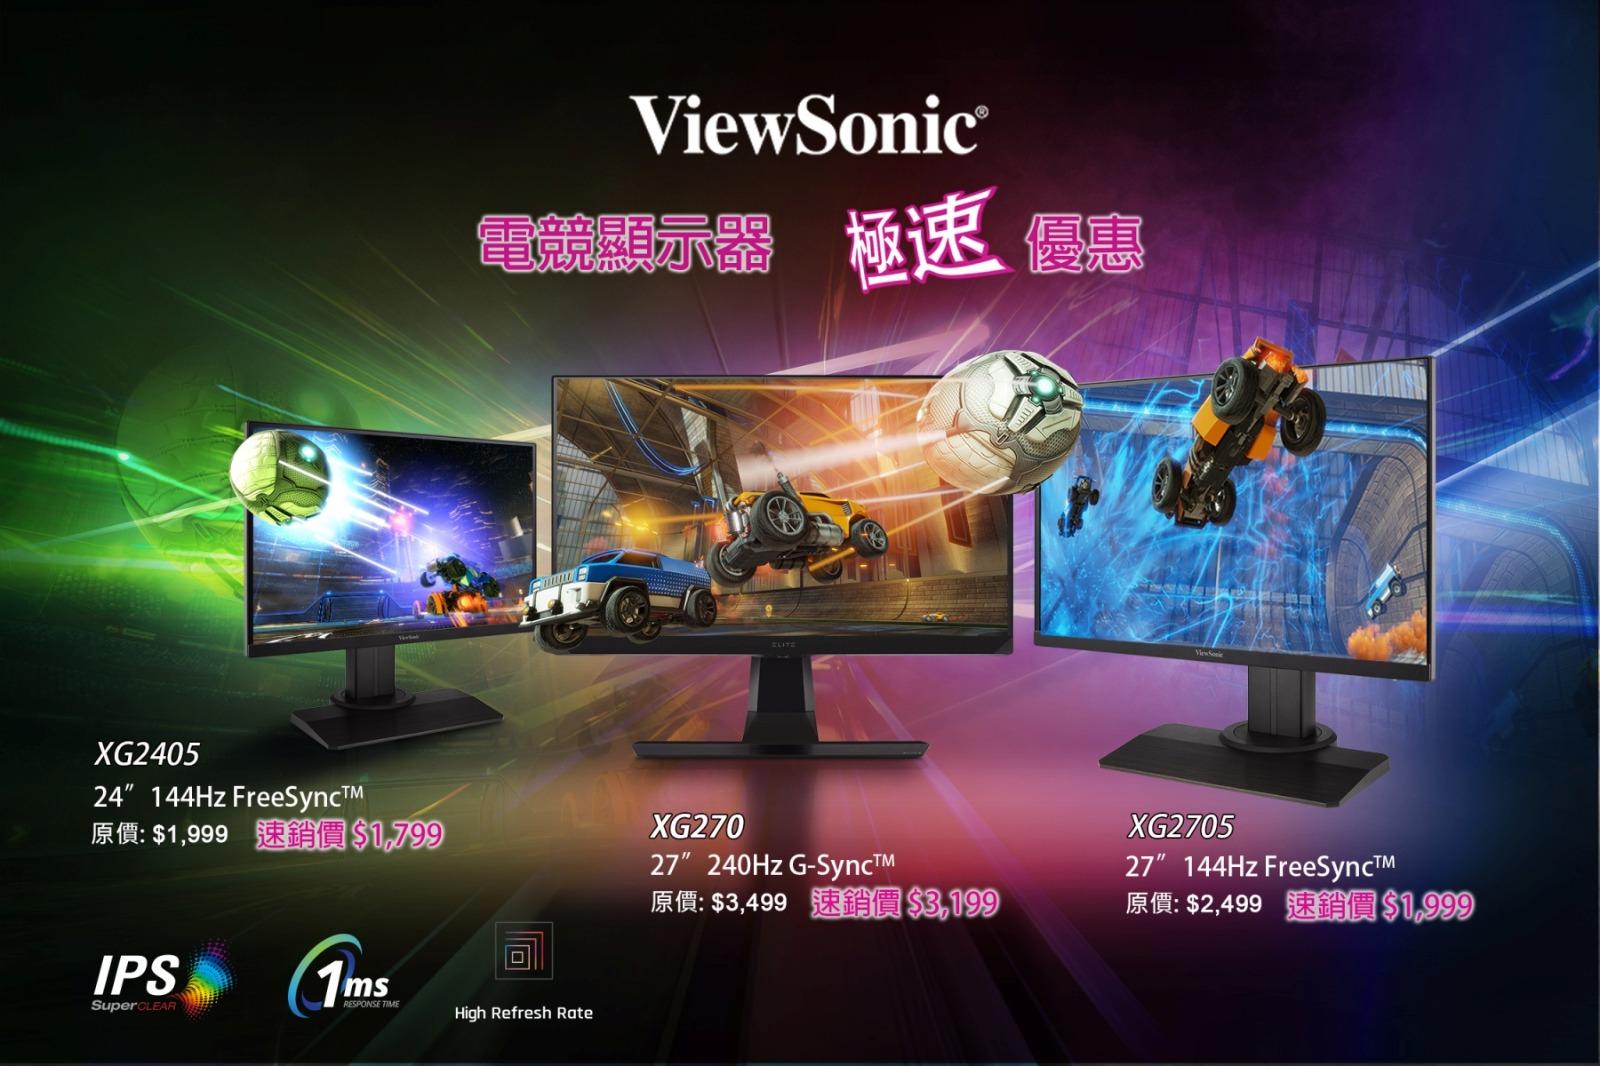 ViewSonic 電競顯示器極速優惠 精選型號折扣高達 HK$500